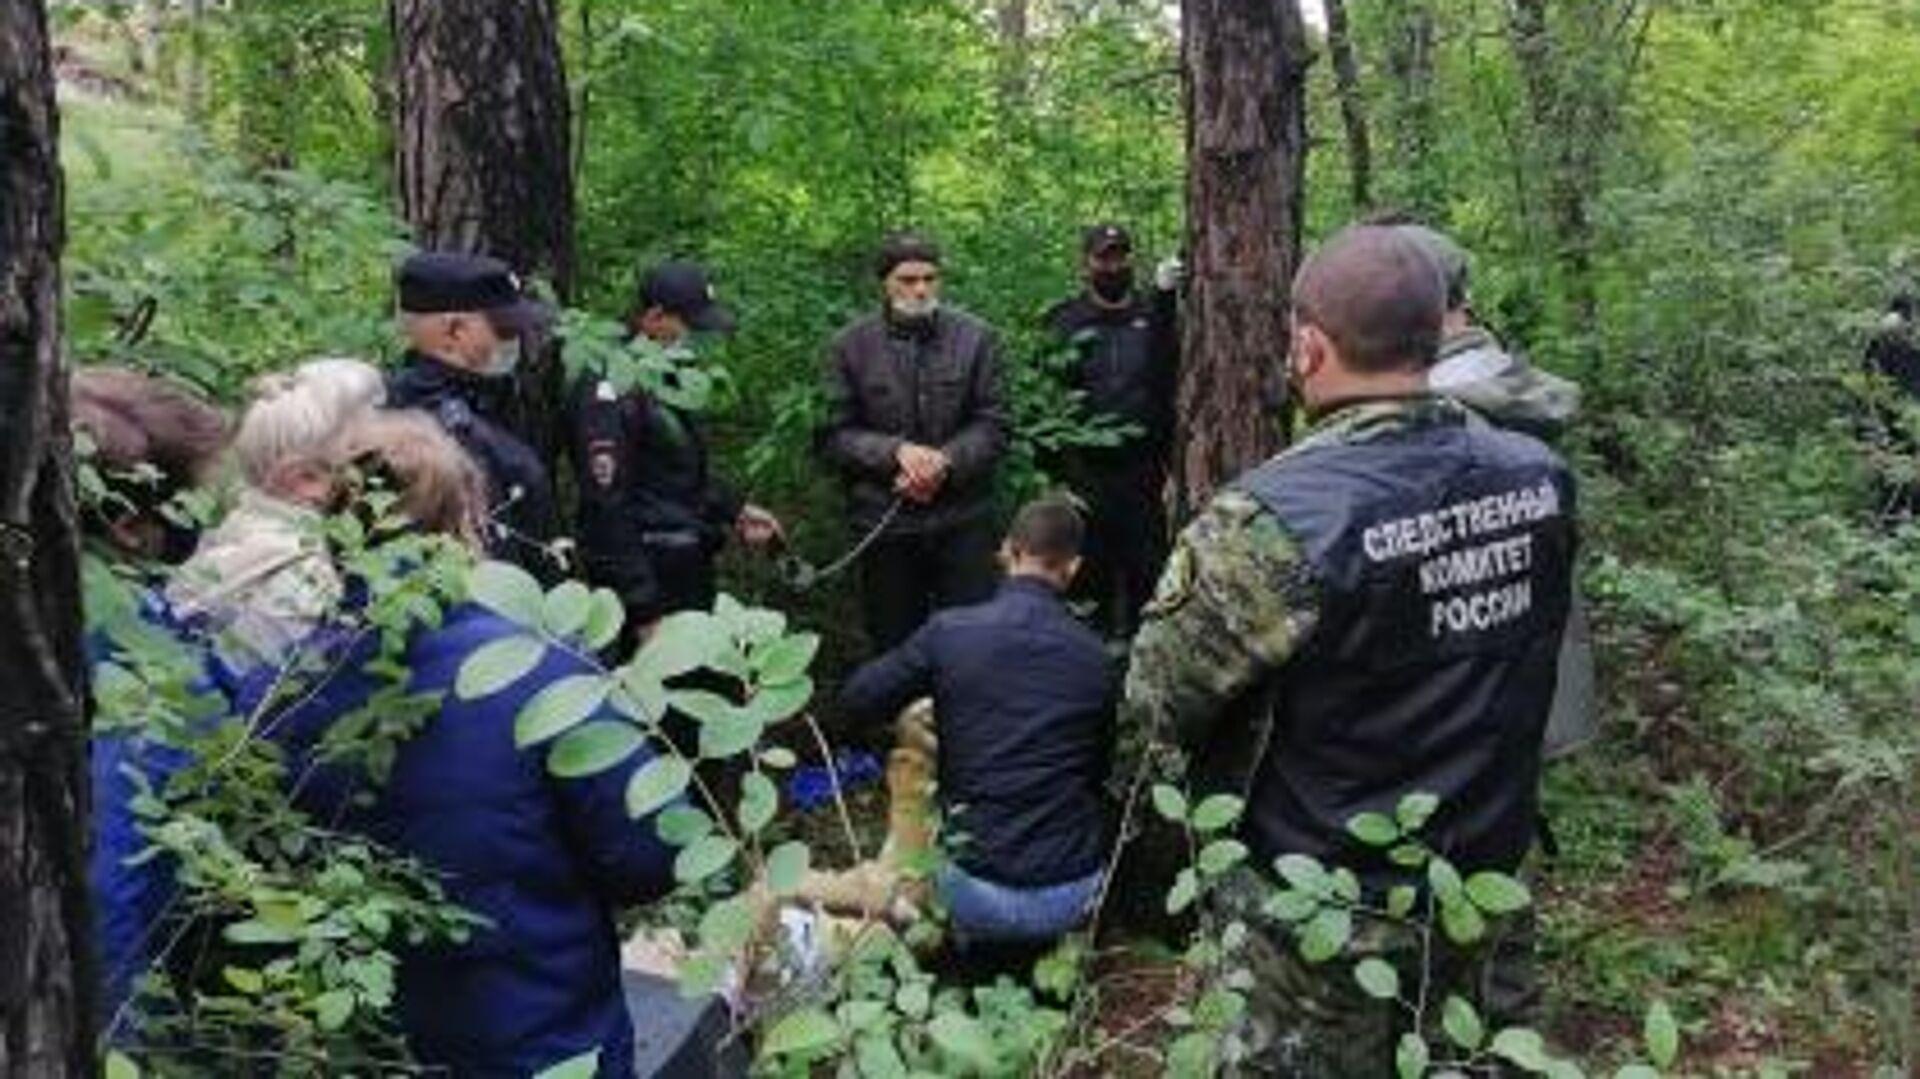 """Заживо сжег младенца"": почему отпустили убийцу из Хакасии"